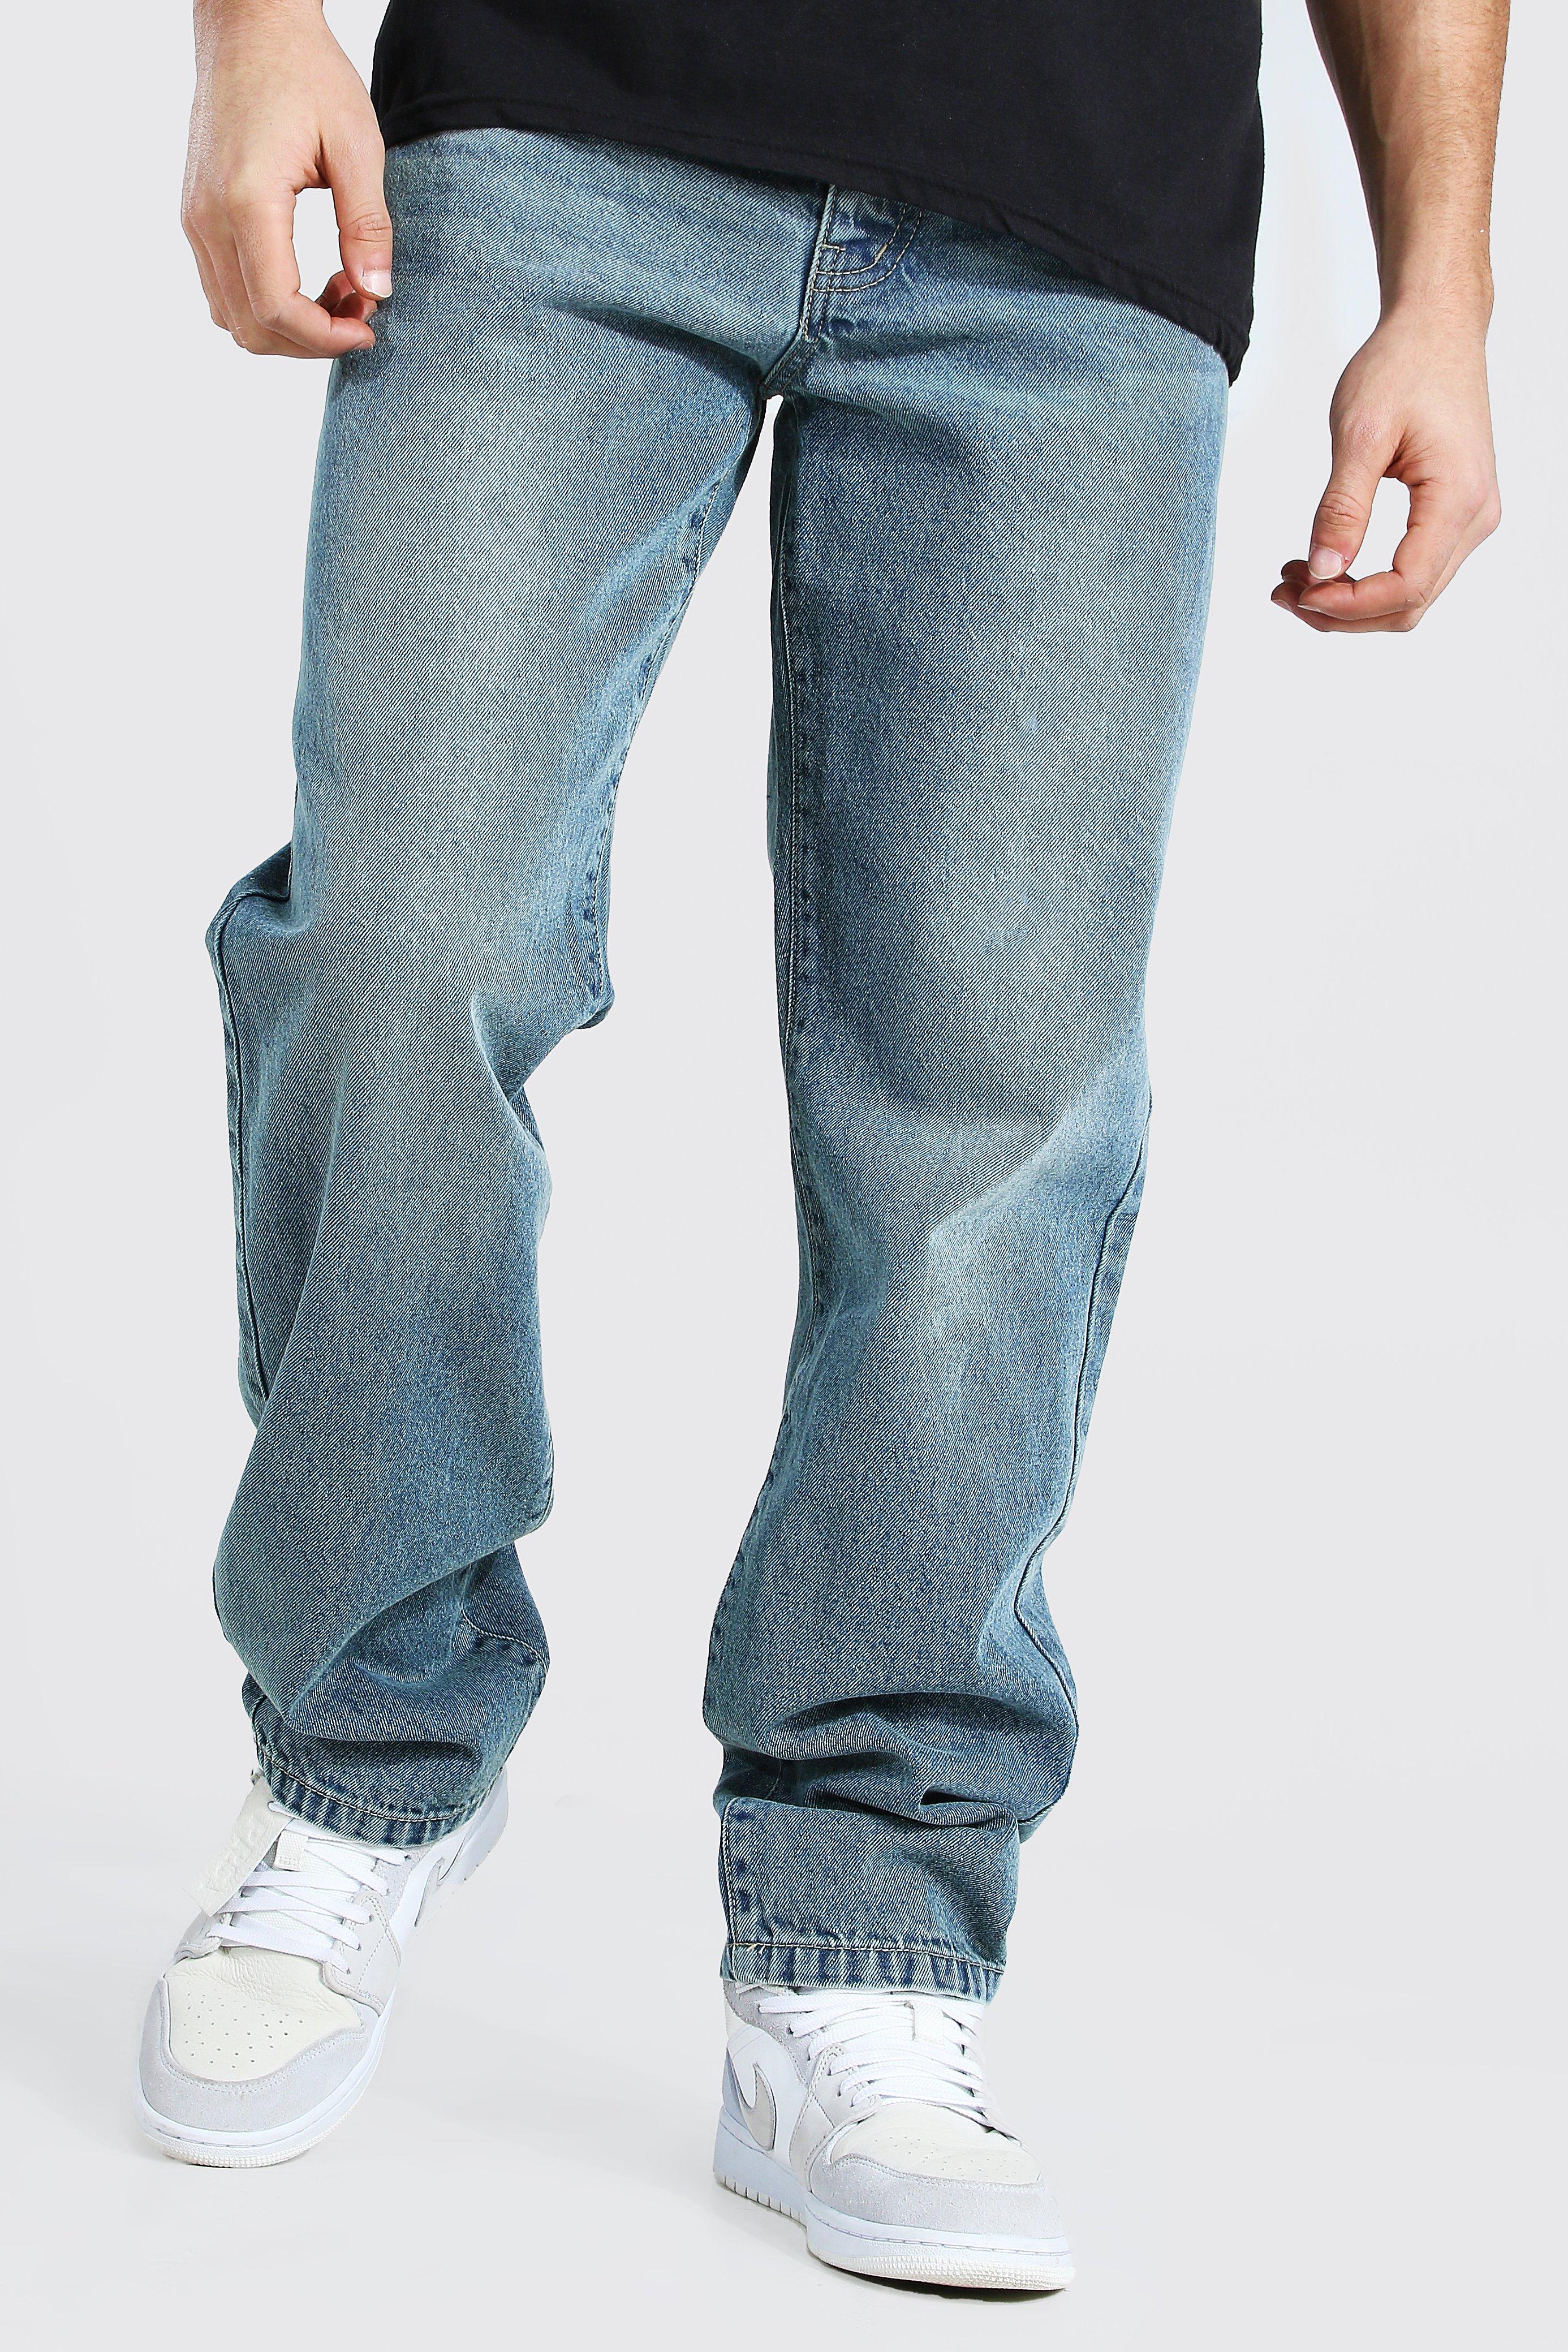 Men's Vintage Pants, Trousers, Jeans, Overalls Mens Relaxed Fit Rigid Jeans - Blue $24.00 AT vintagedancer.com